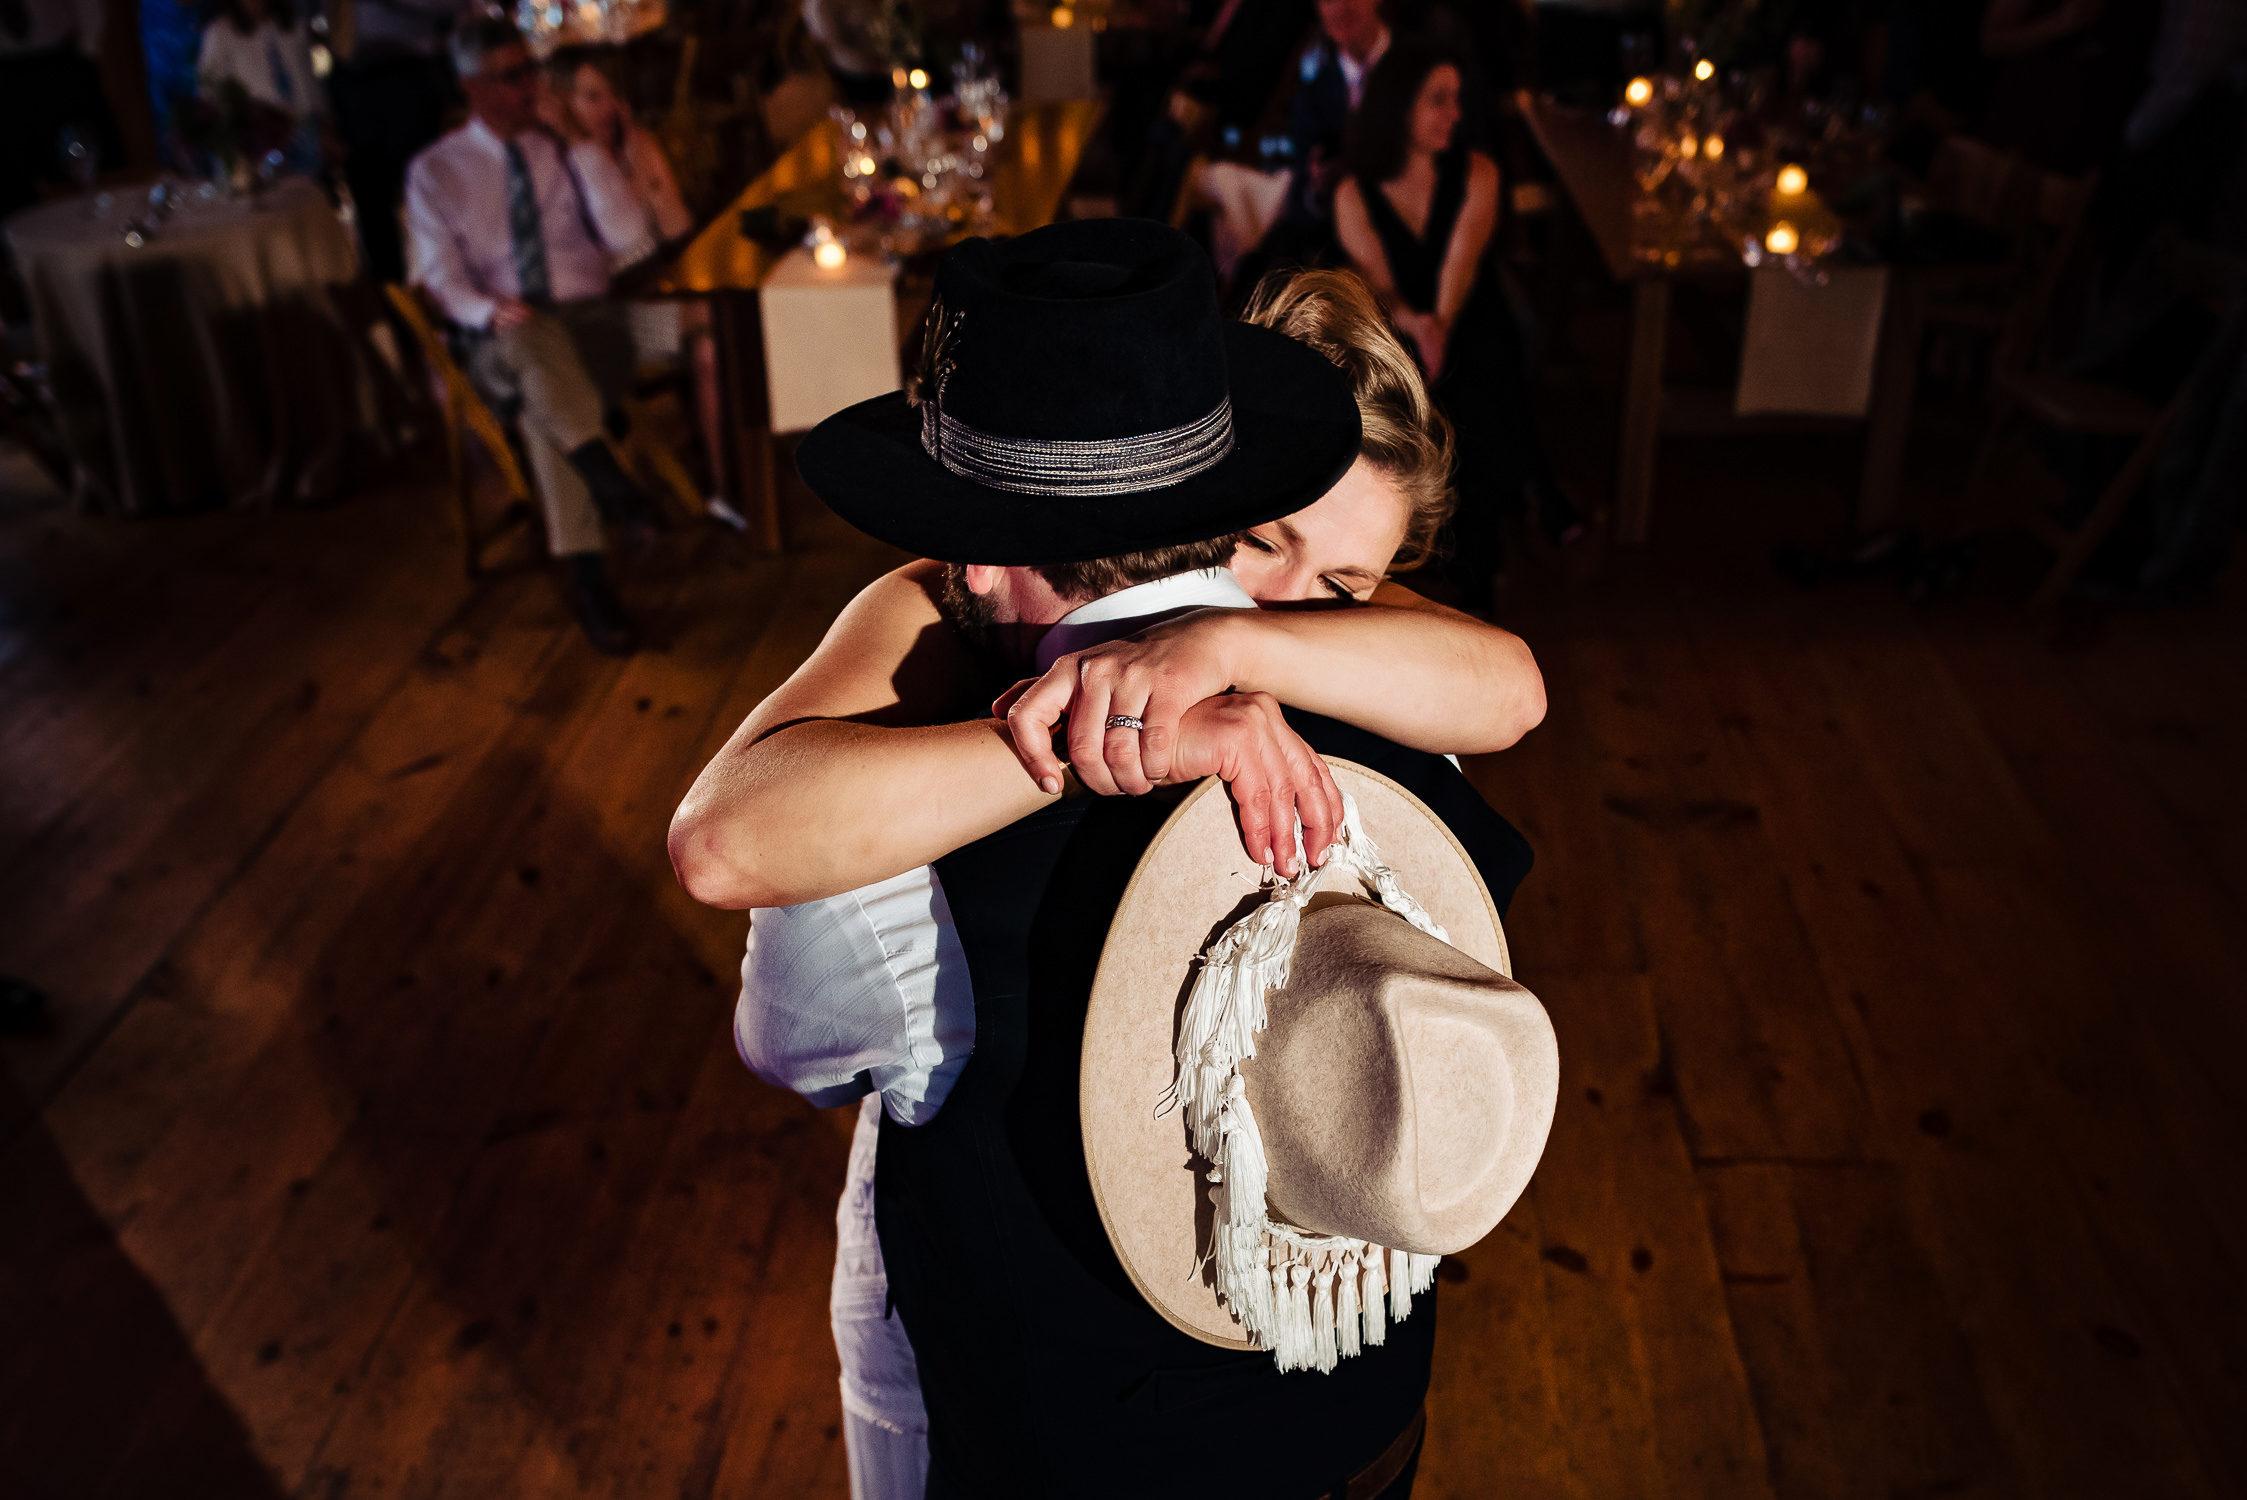 tourterelle-vermont-wedding-photographers-047-2-2247x1500.jpg